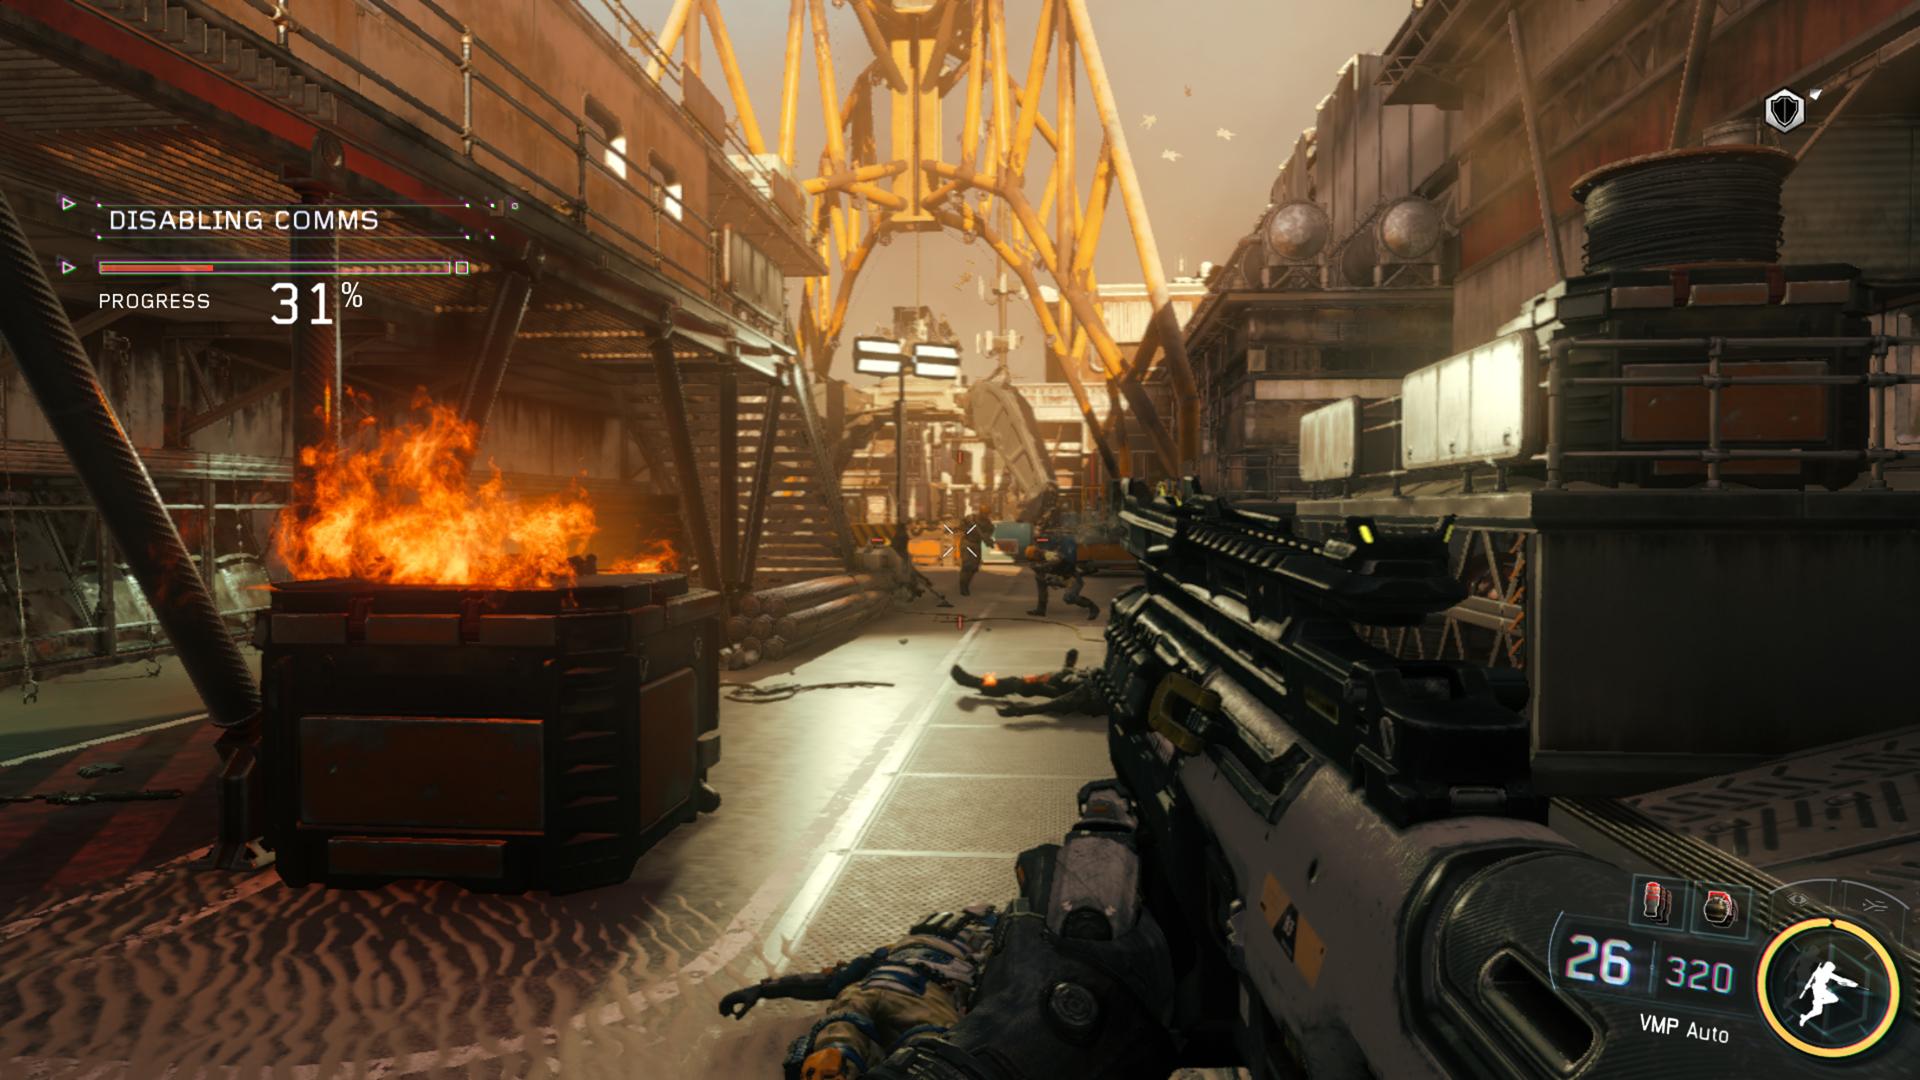 Xbox One S Black Ops III